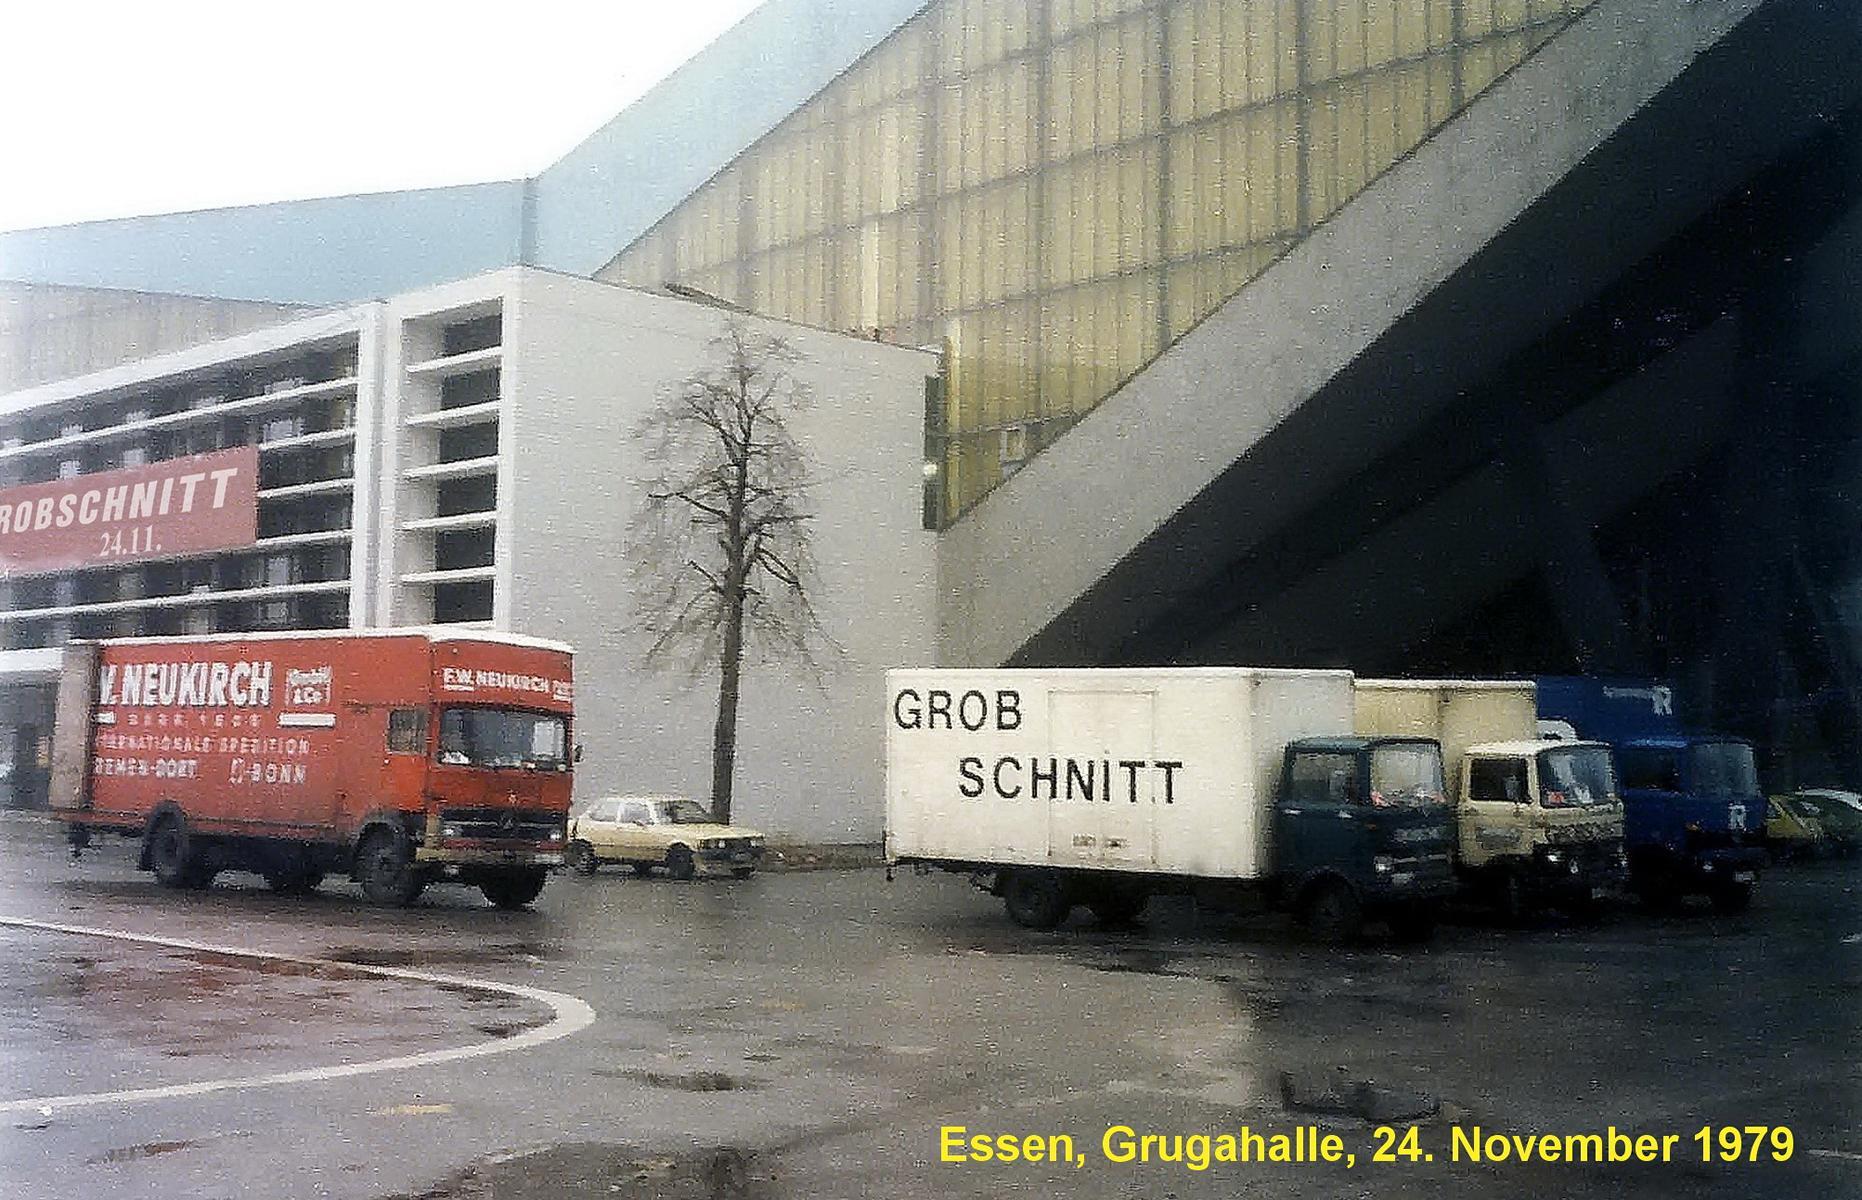 Grobschnitt-LKW vor Grugahalle